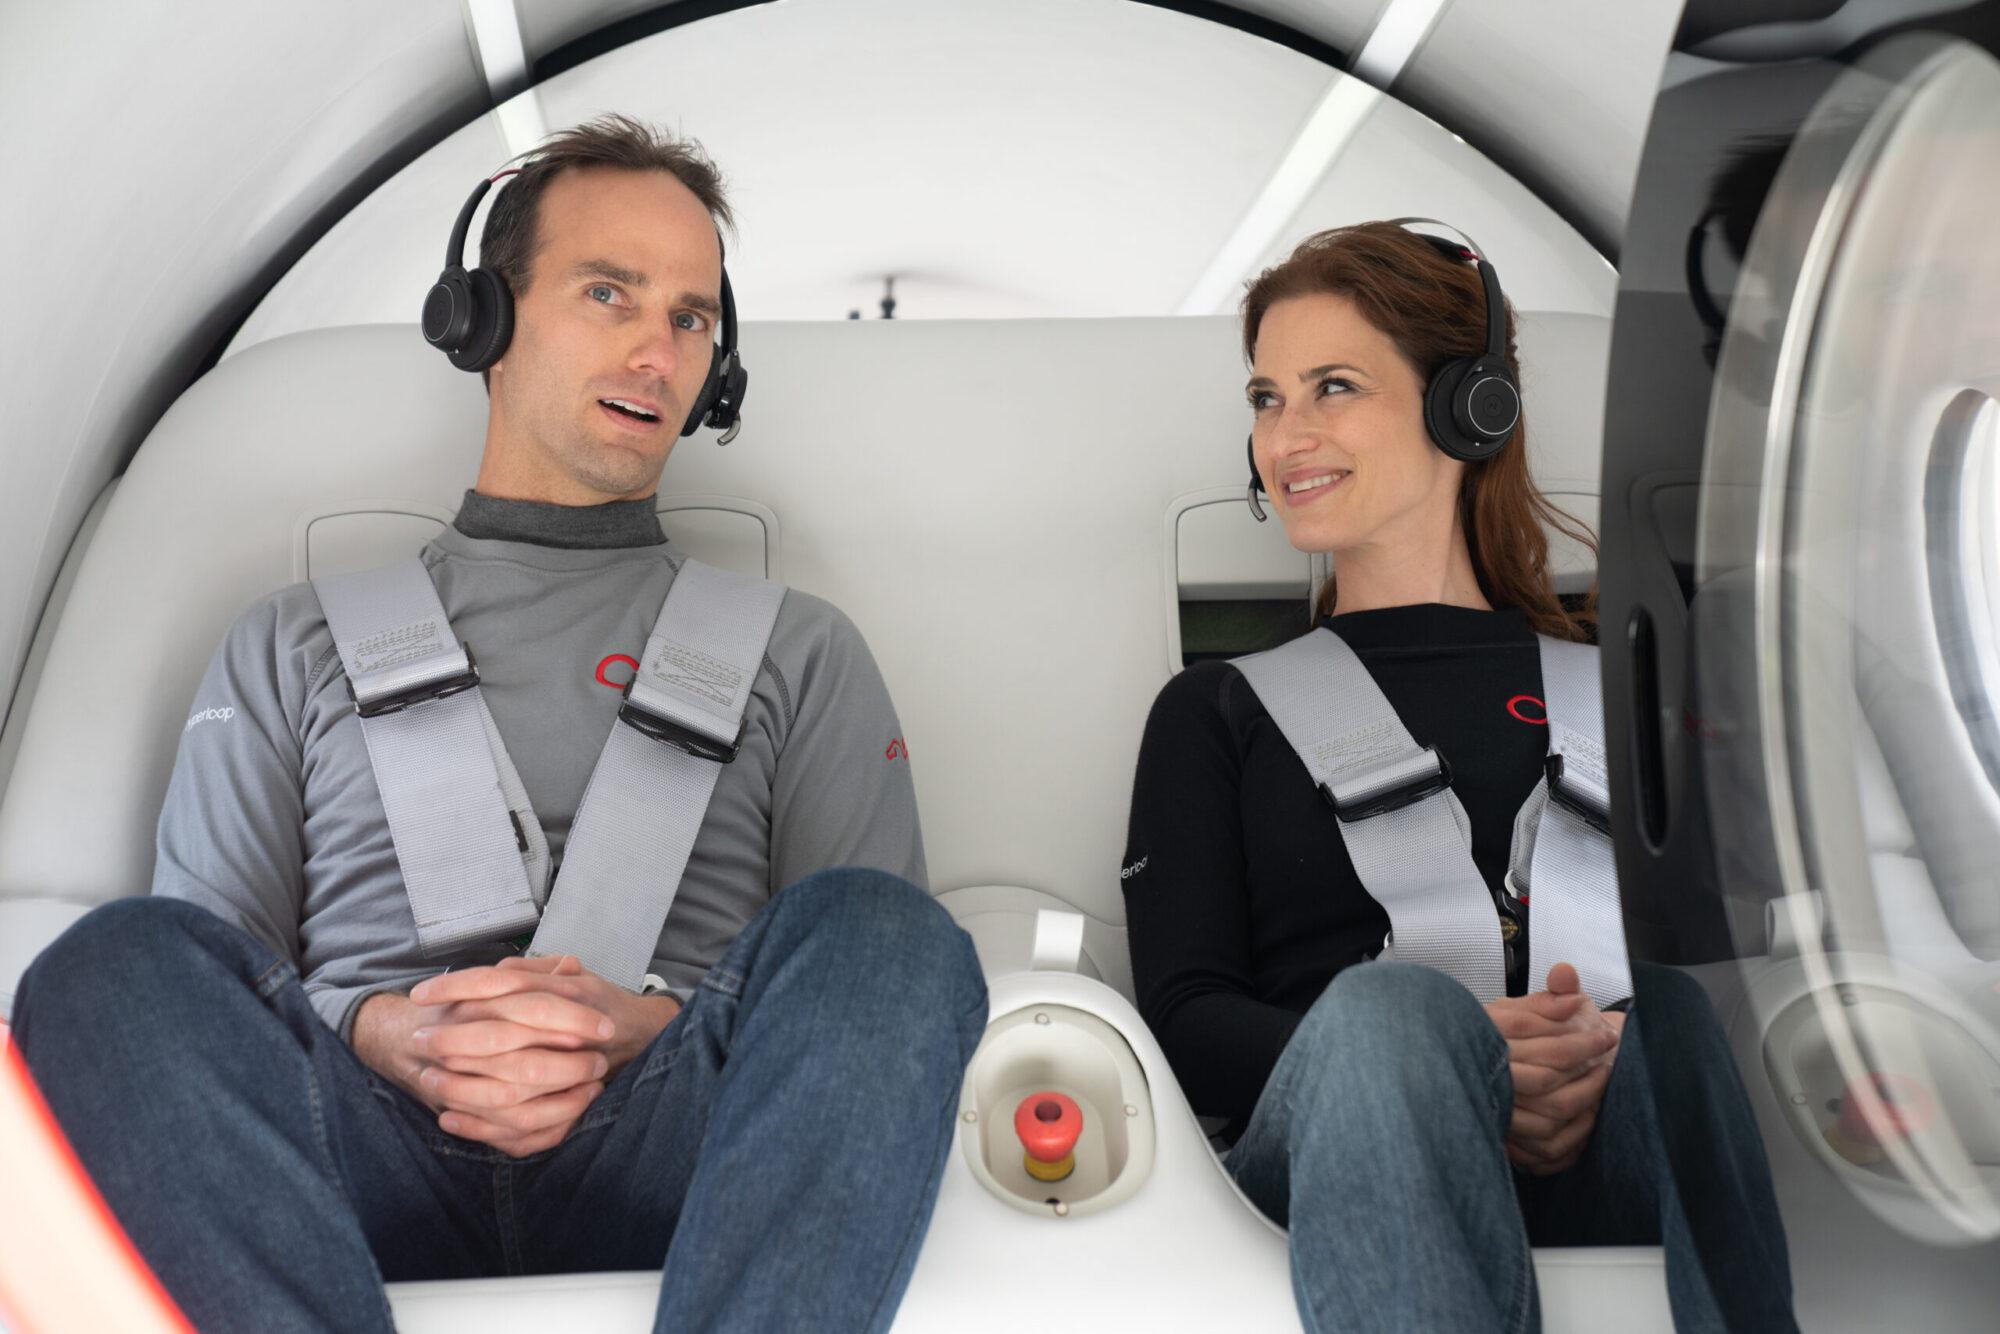 Levitating Virgin Hyperloop pod completes first passenger test